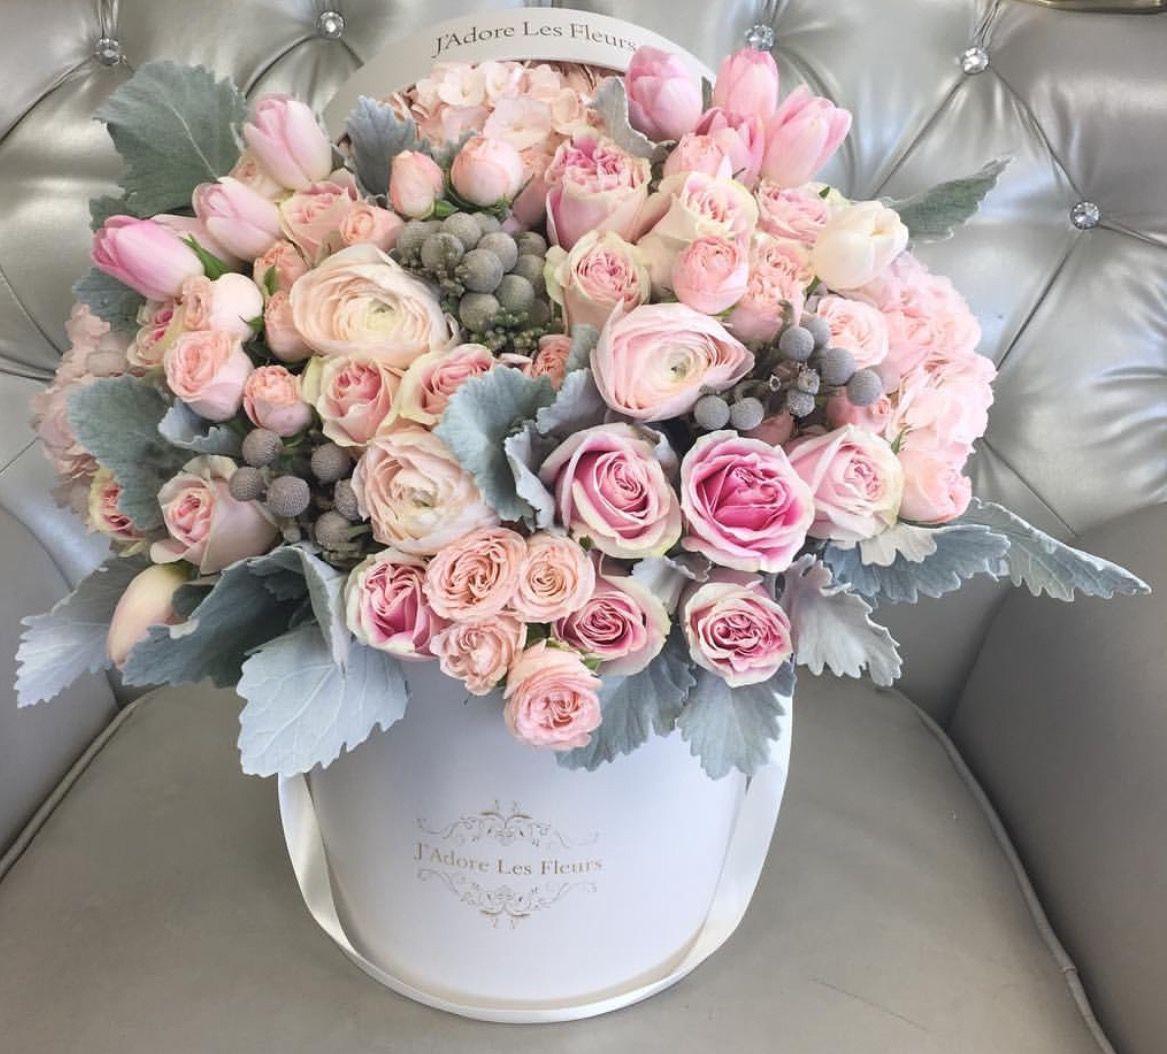 Pin de Liza Dinata en FLOWER BOX 4 | Pinterest | Día de la madre, La ...